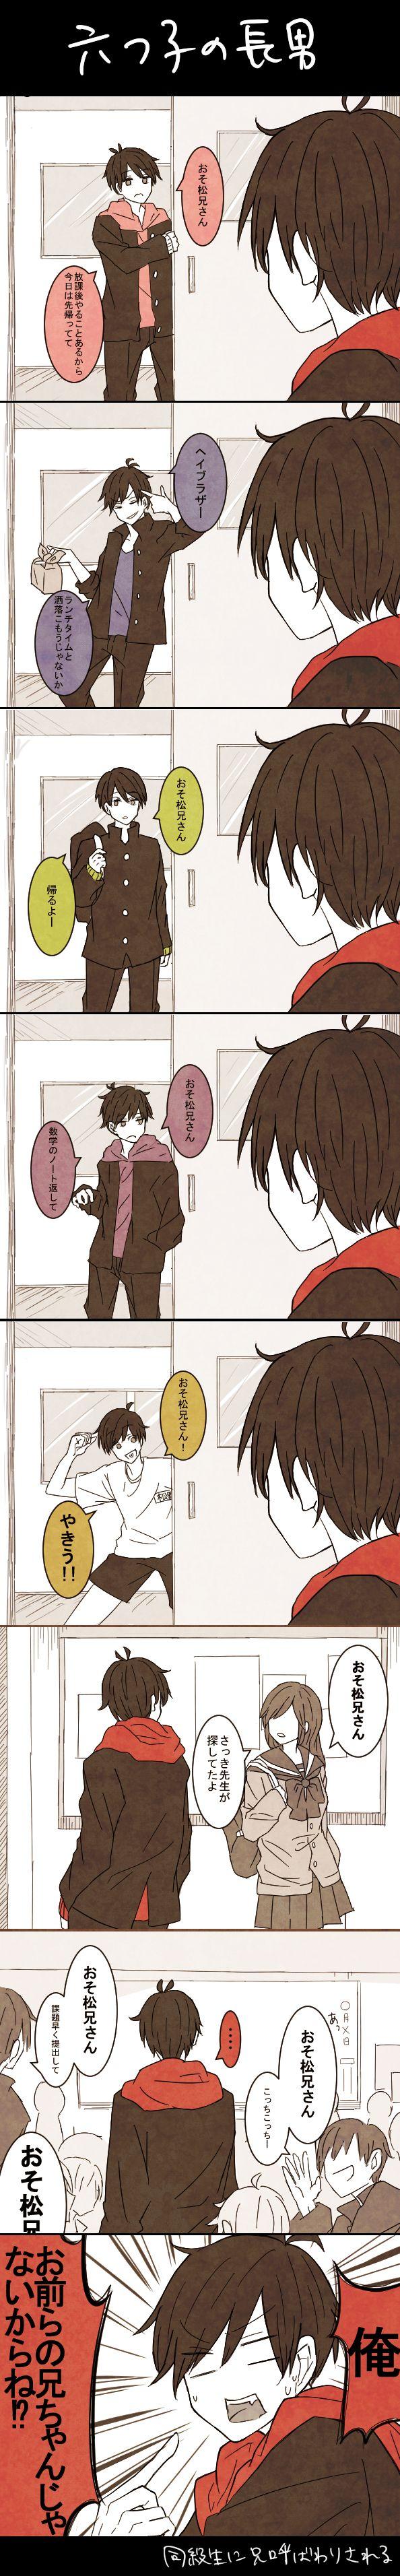 Osomatsu is everyone's nii-san lol